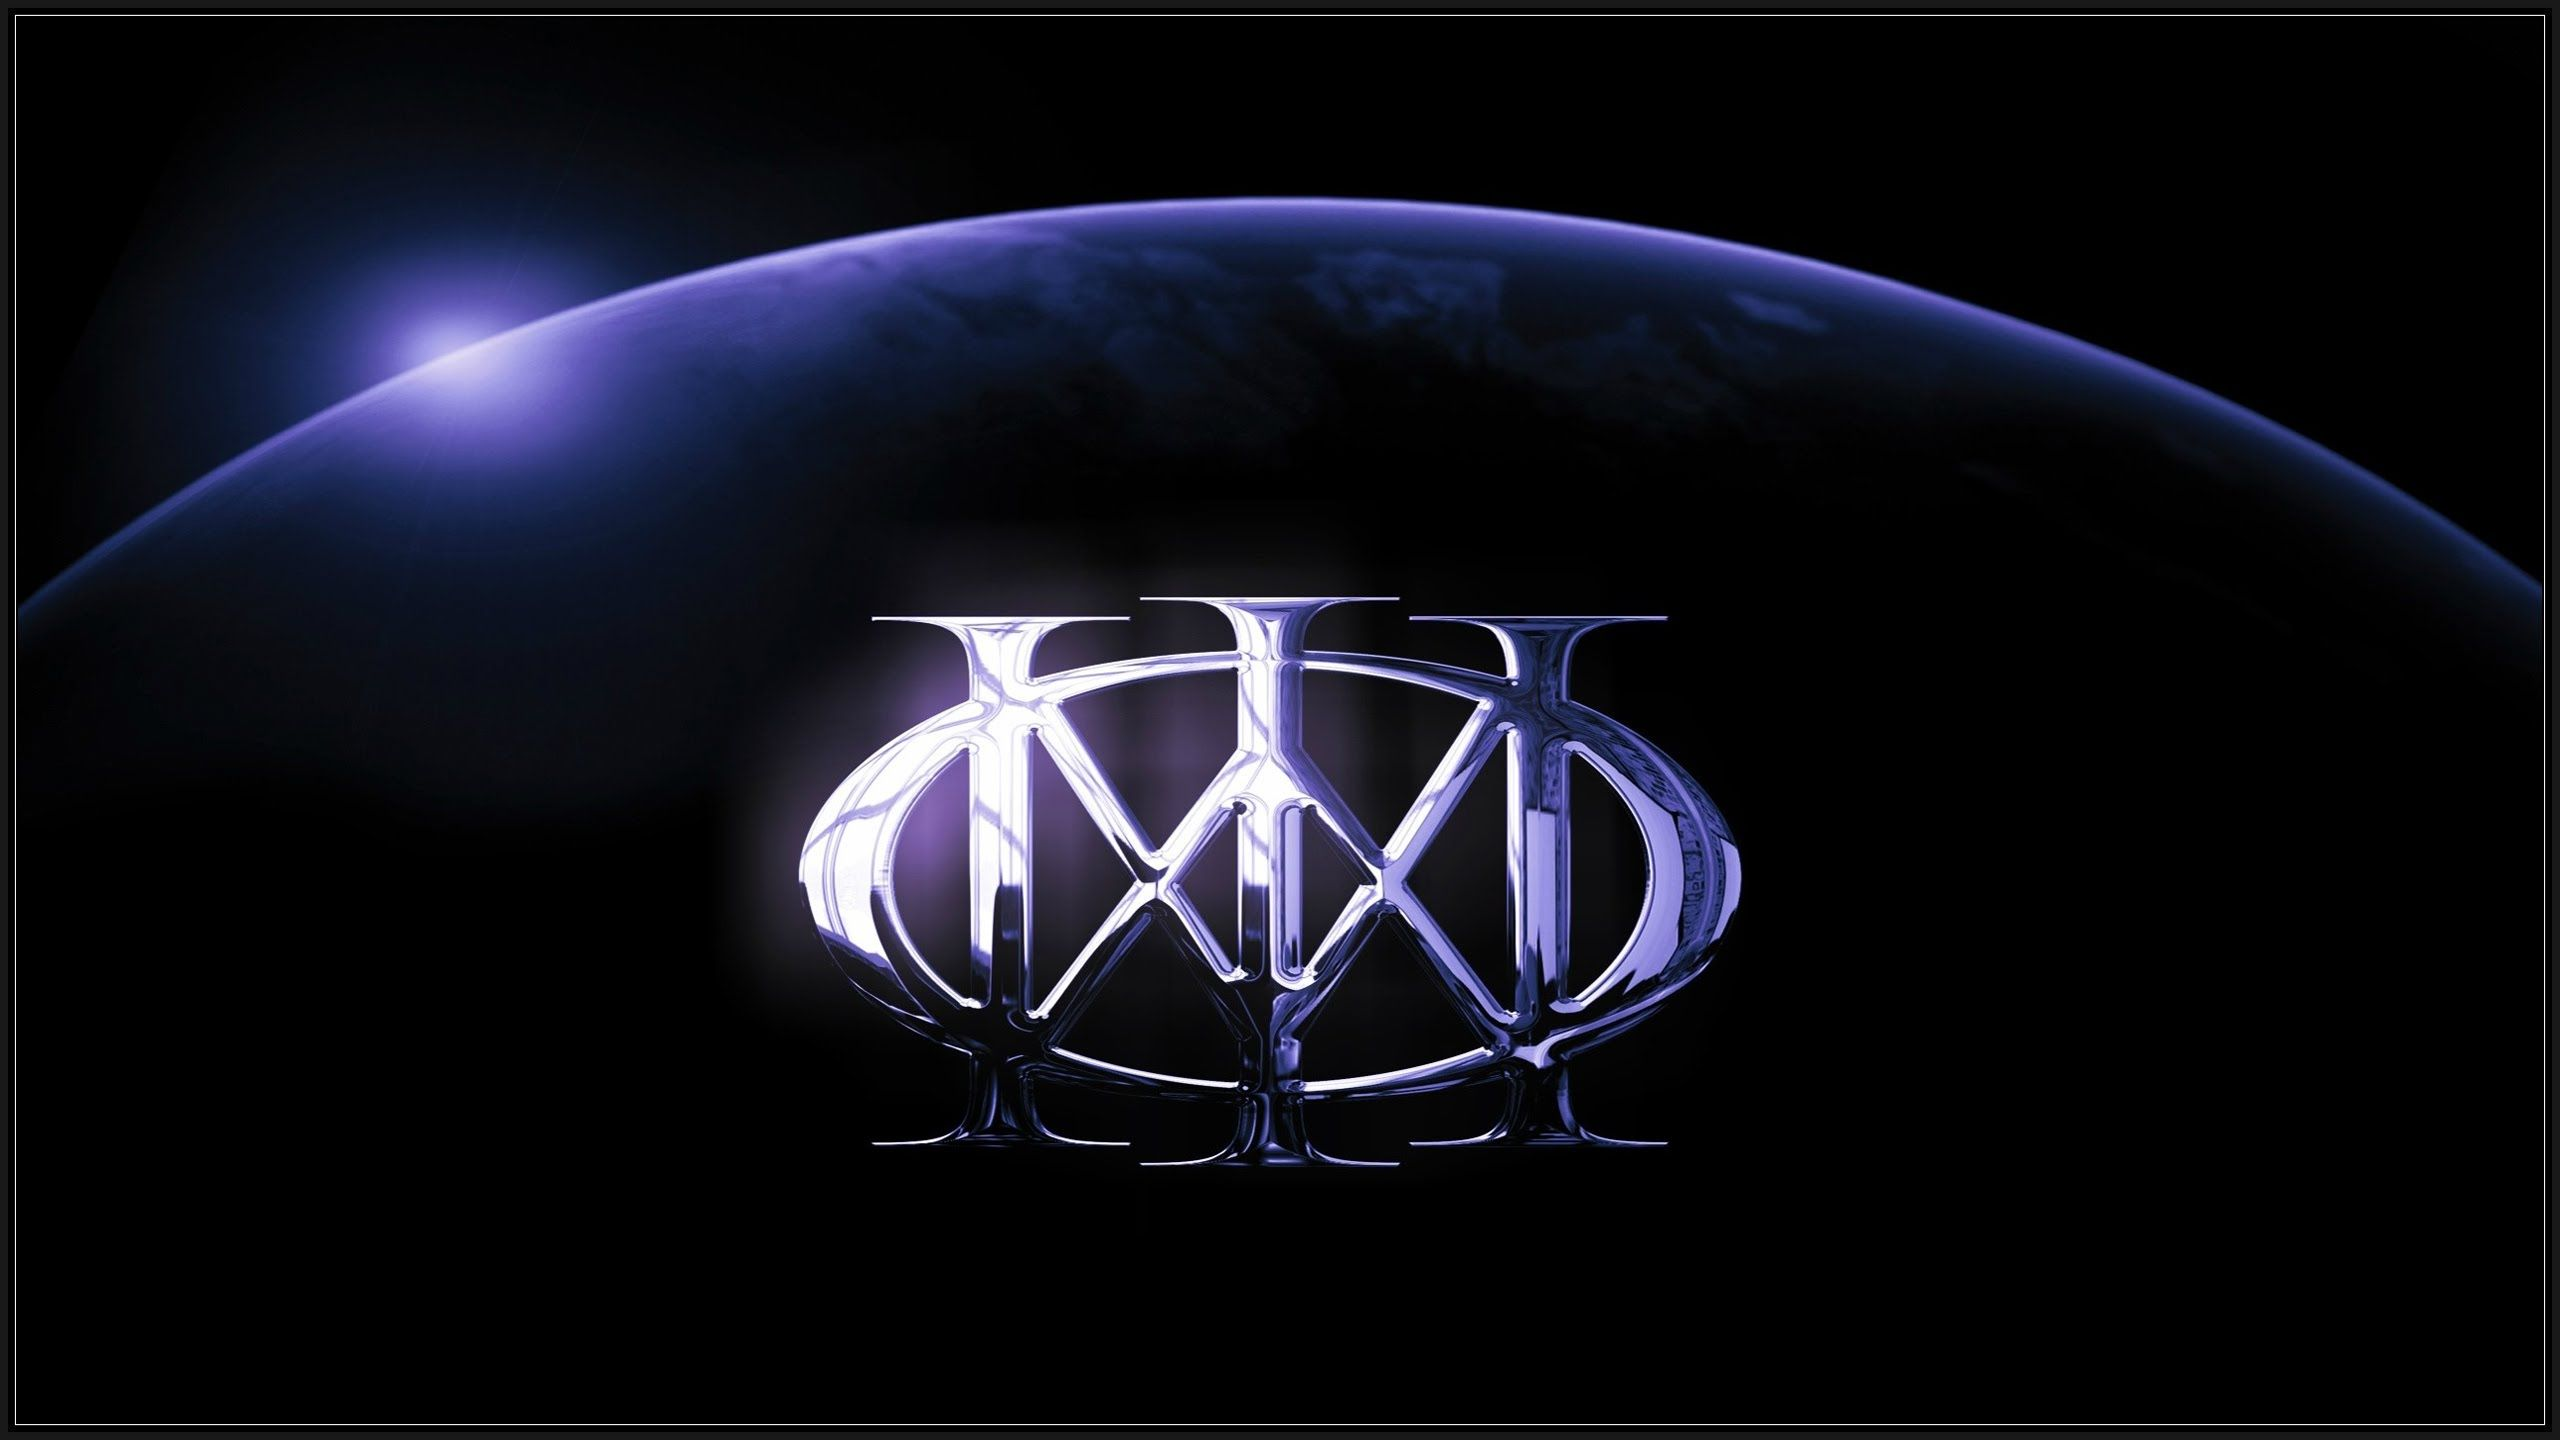 Dream Theater - Dream Theater (Full Album, Perfect Sync, 5.1 Audio Mix) HD